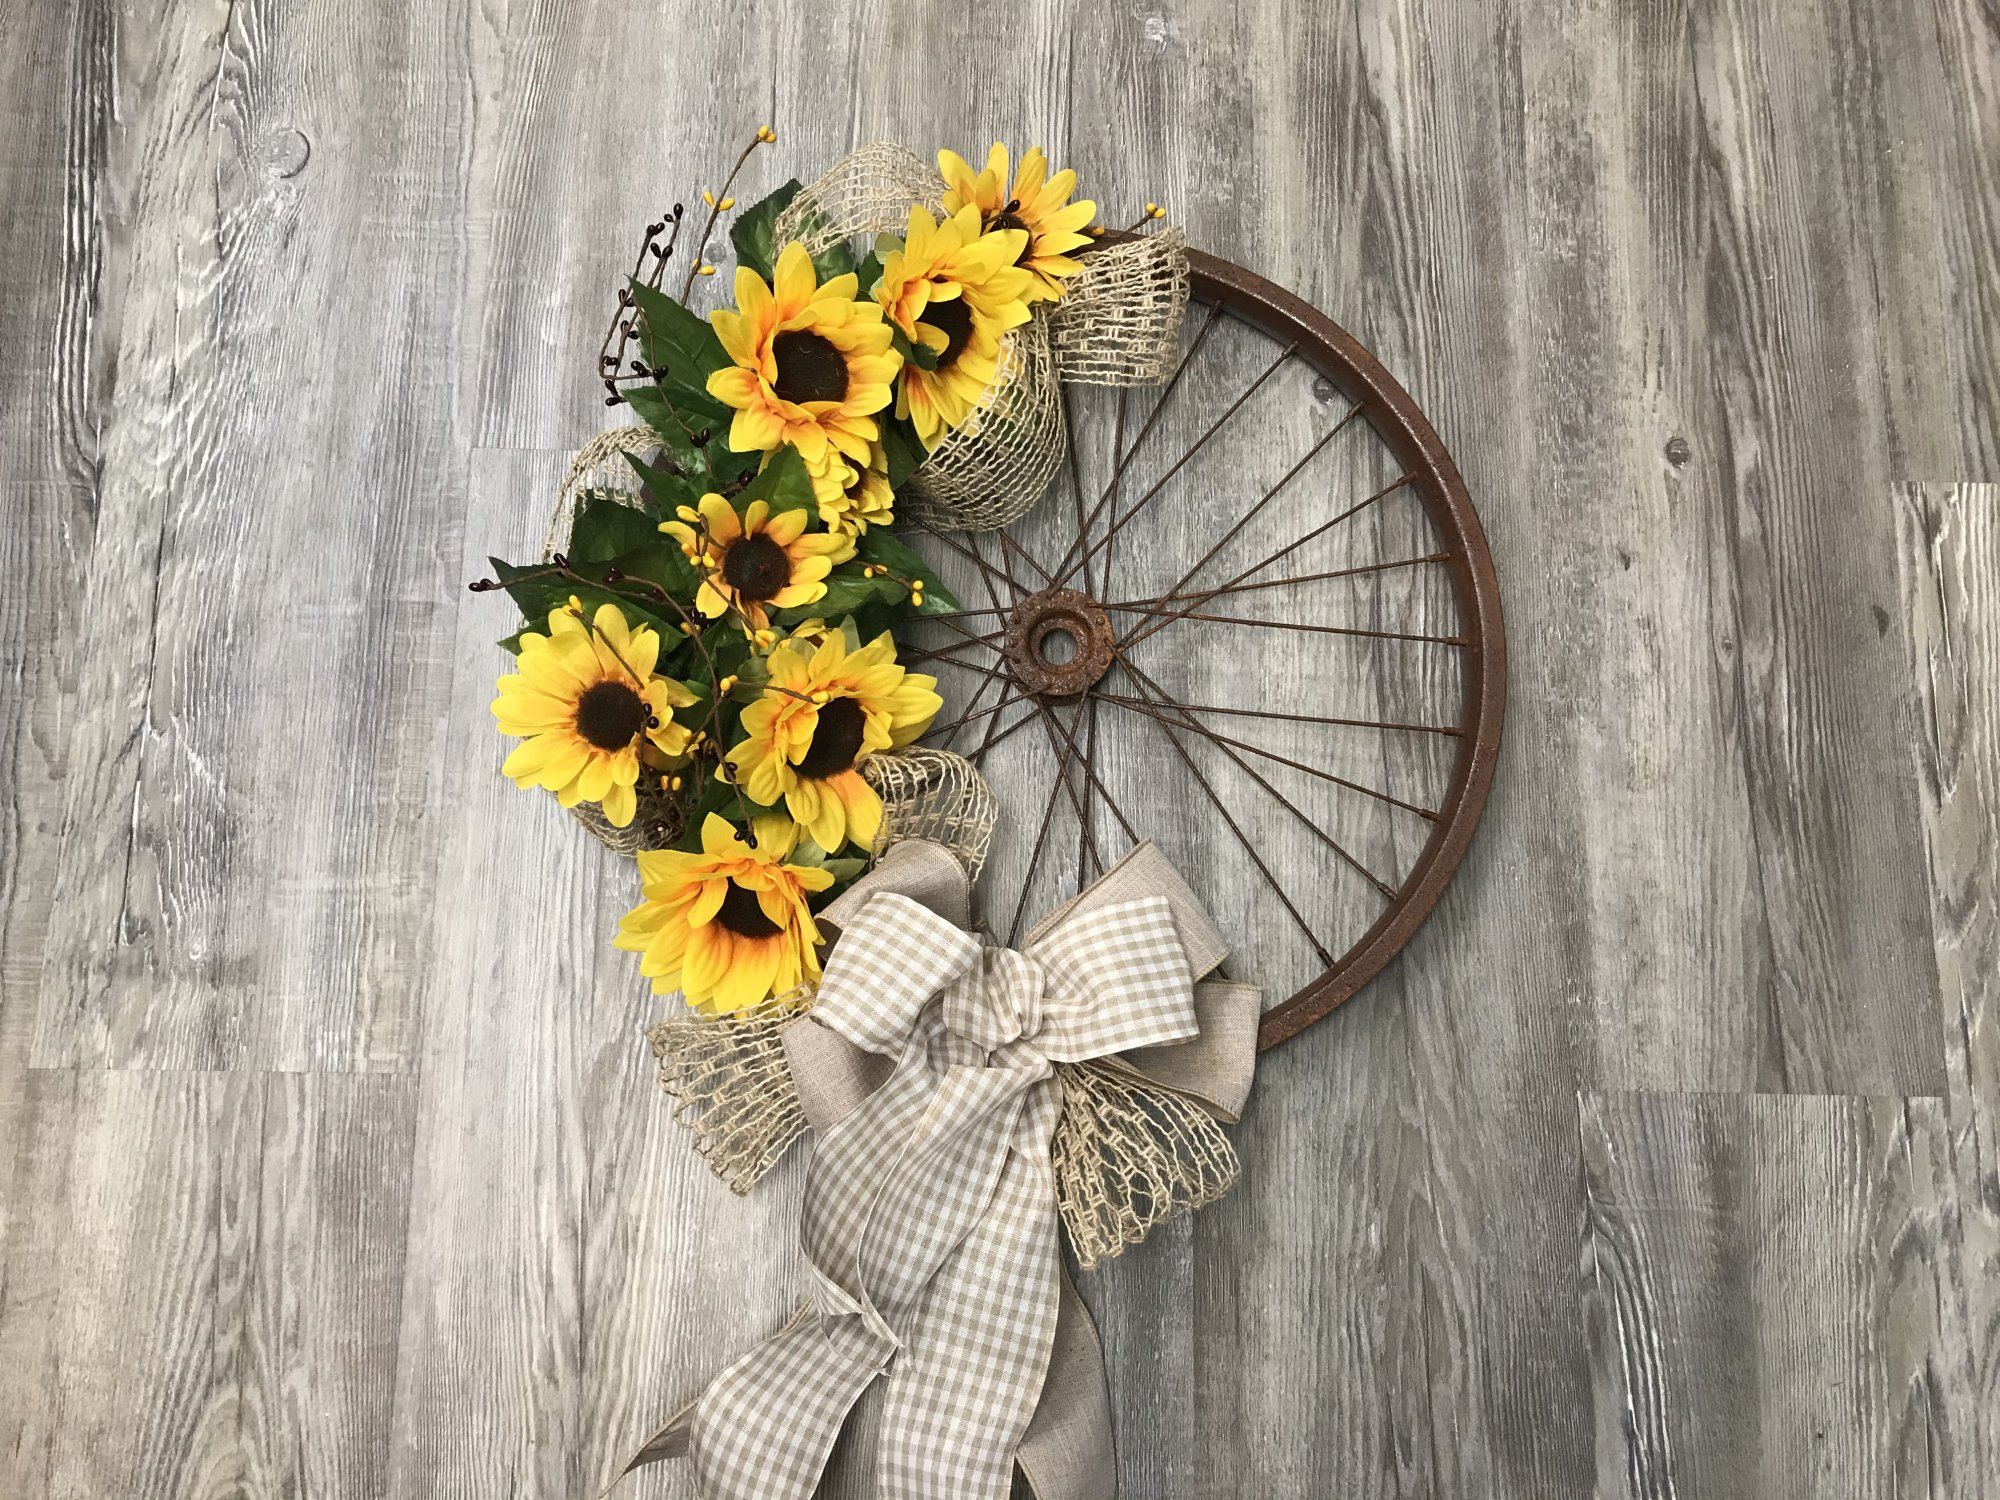 Sunflower Bicycle Rim Wreath